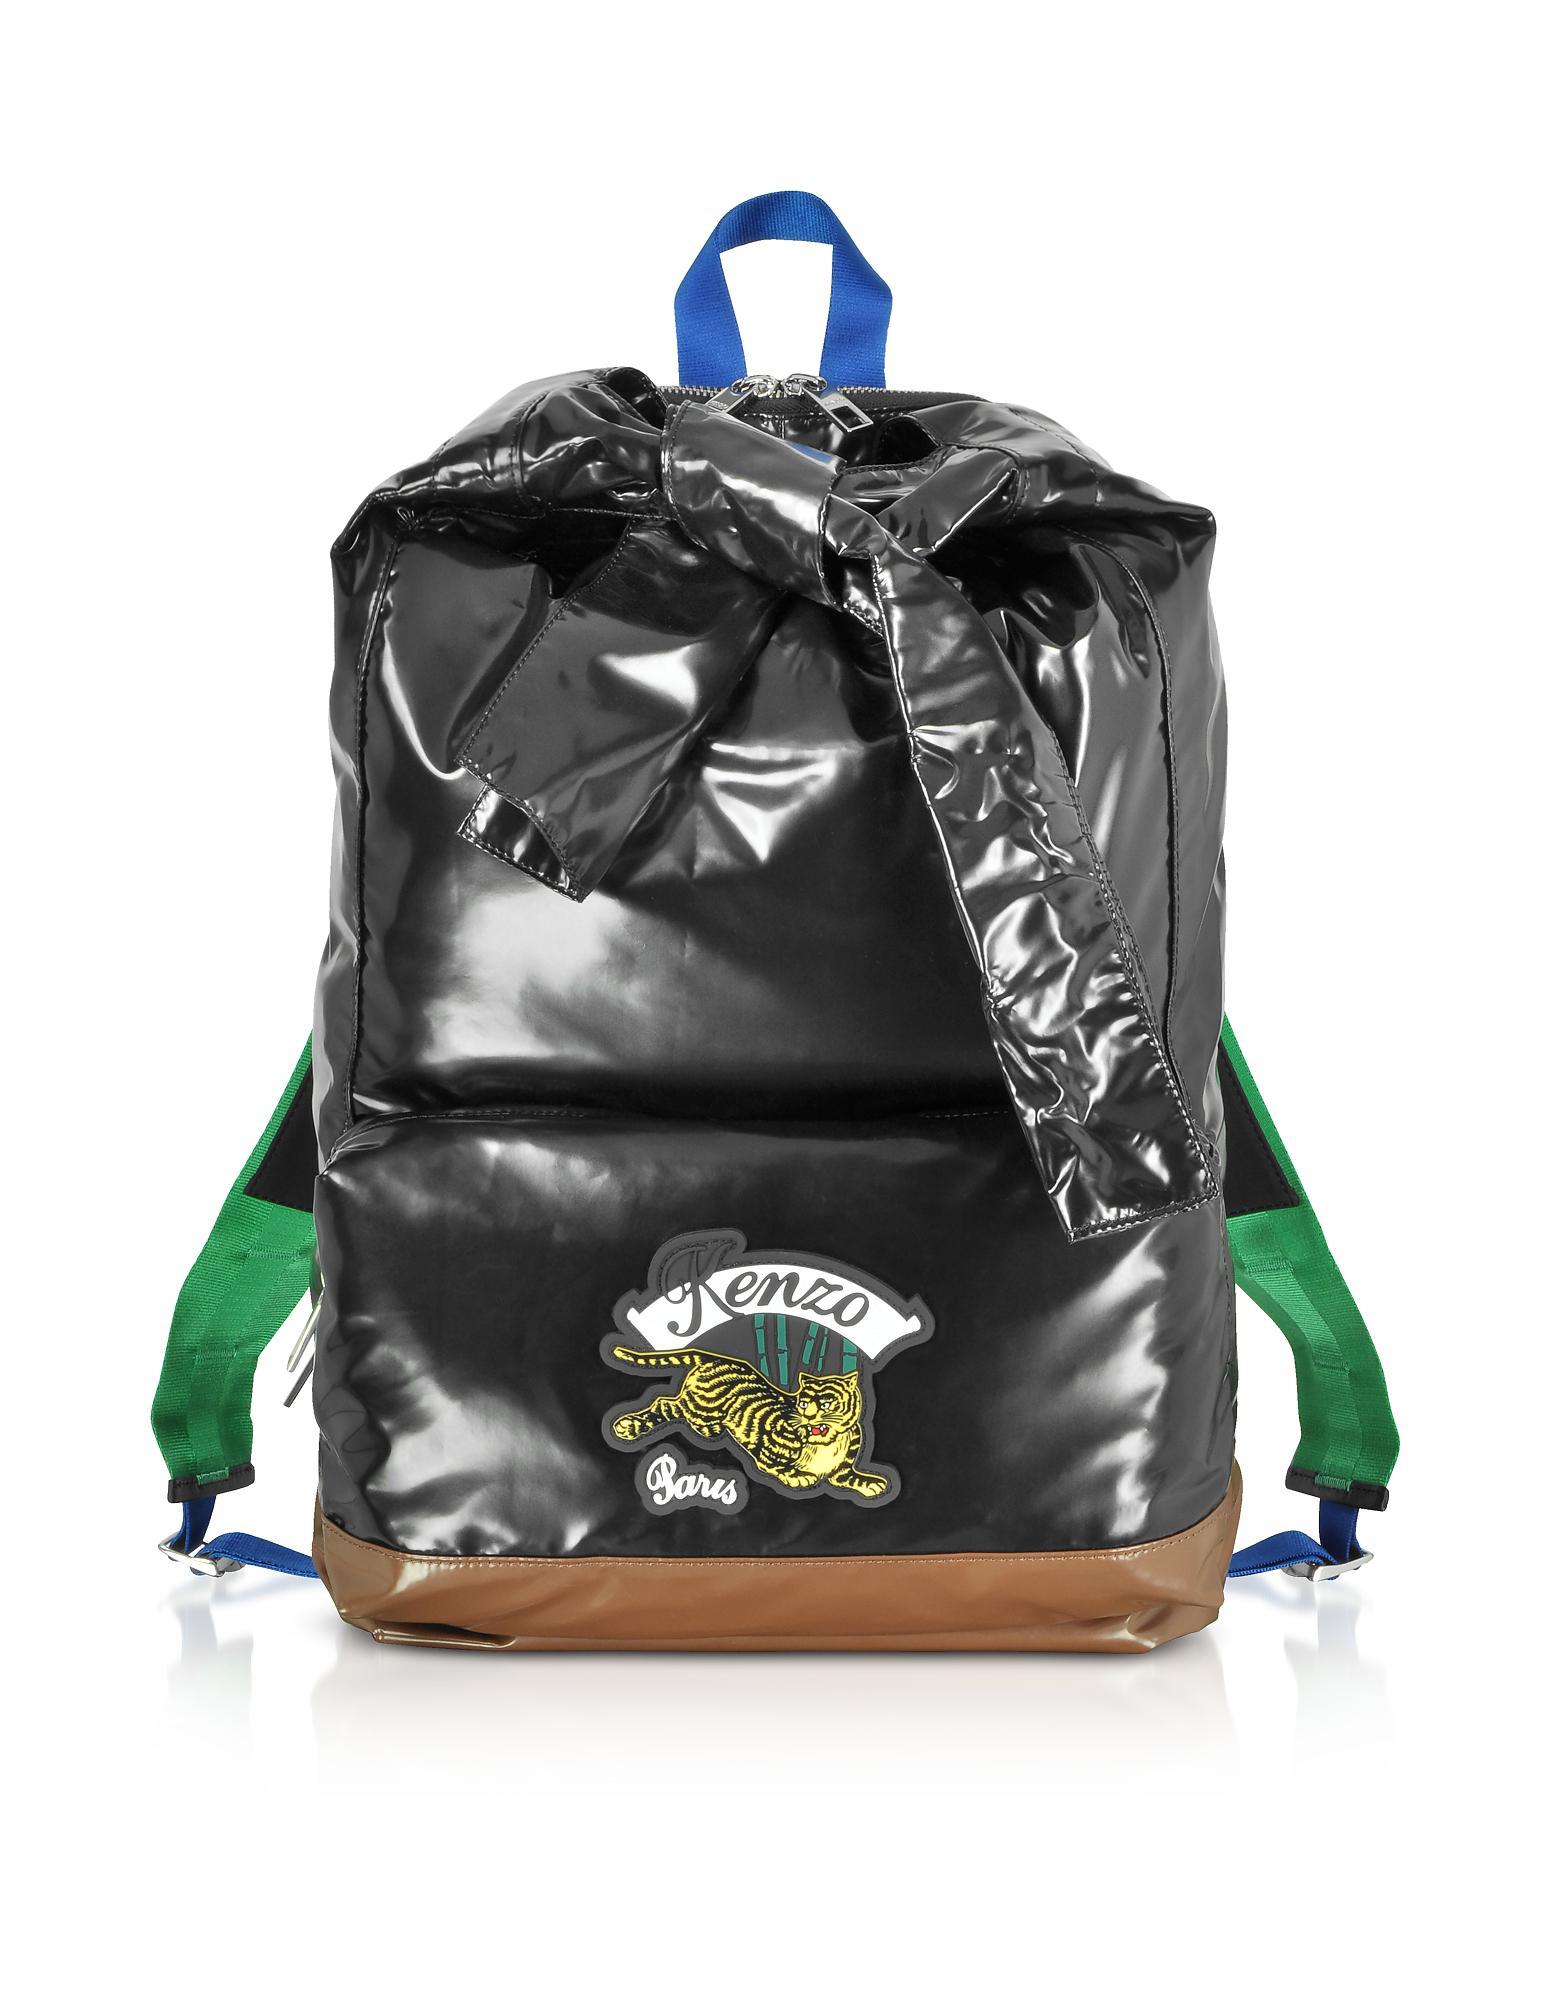 Kenzo Handbags, Bamboo Tiger Rucksack